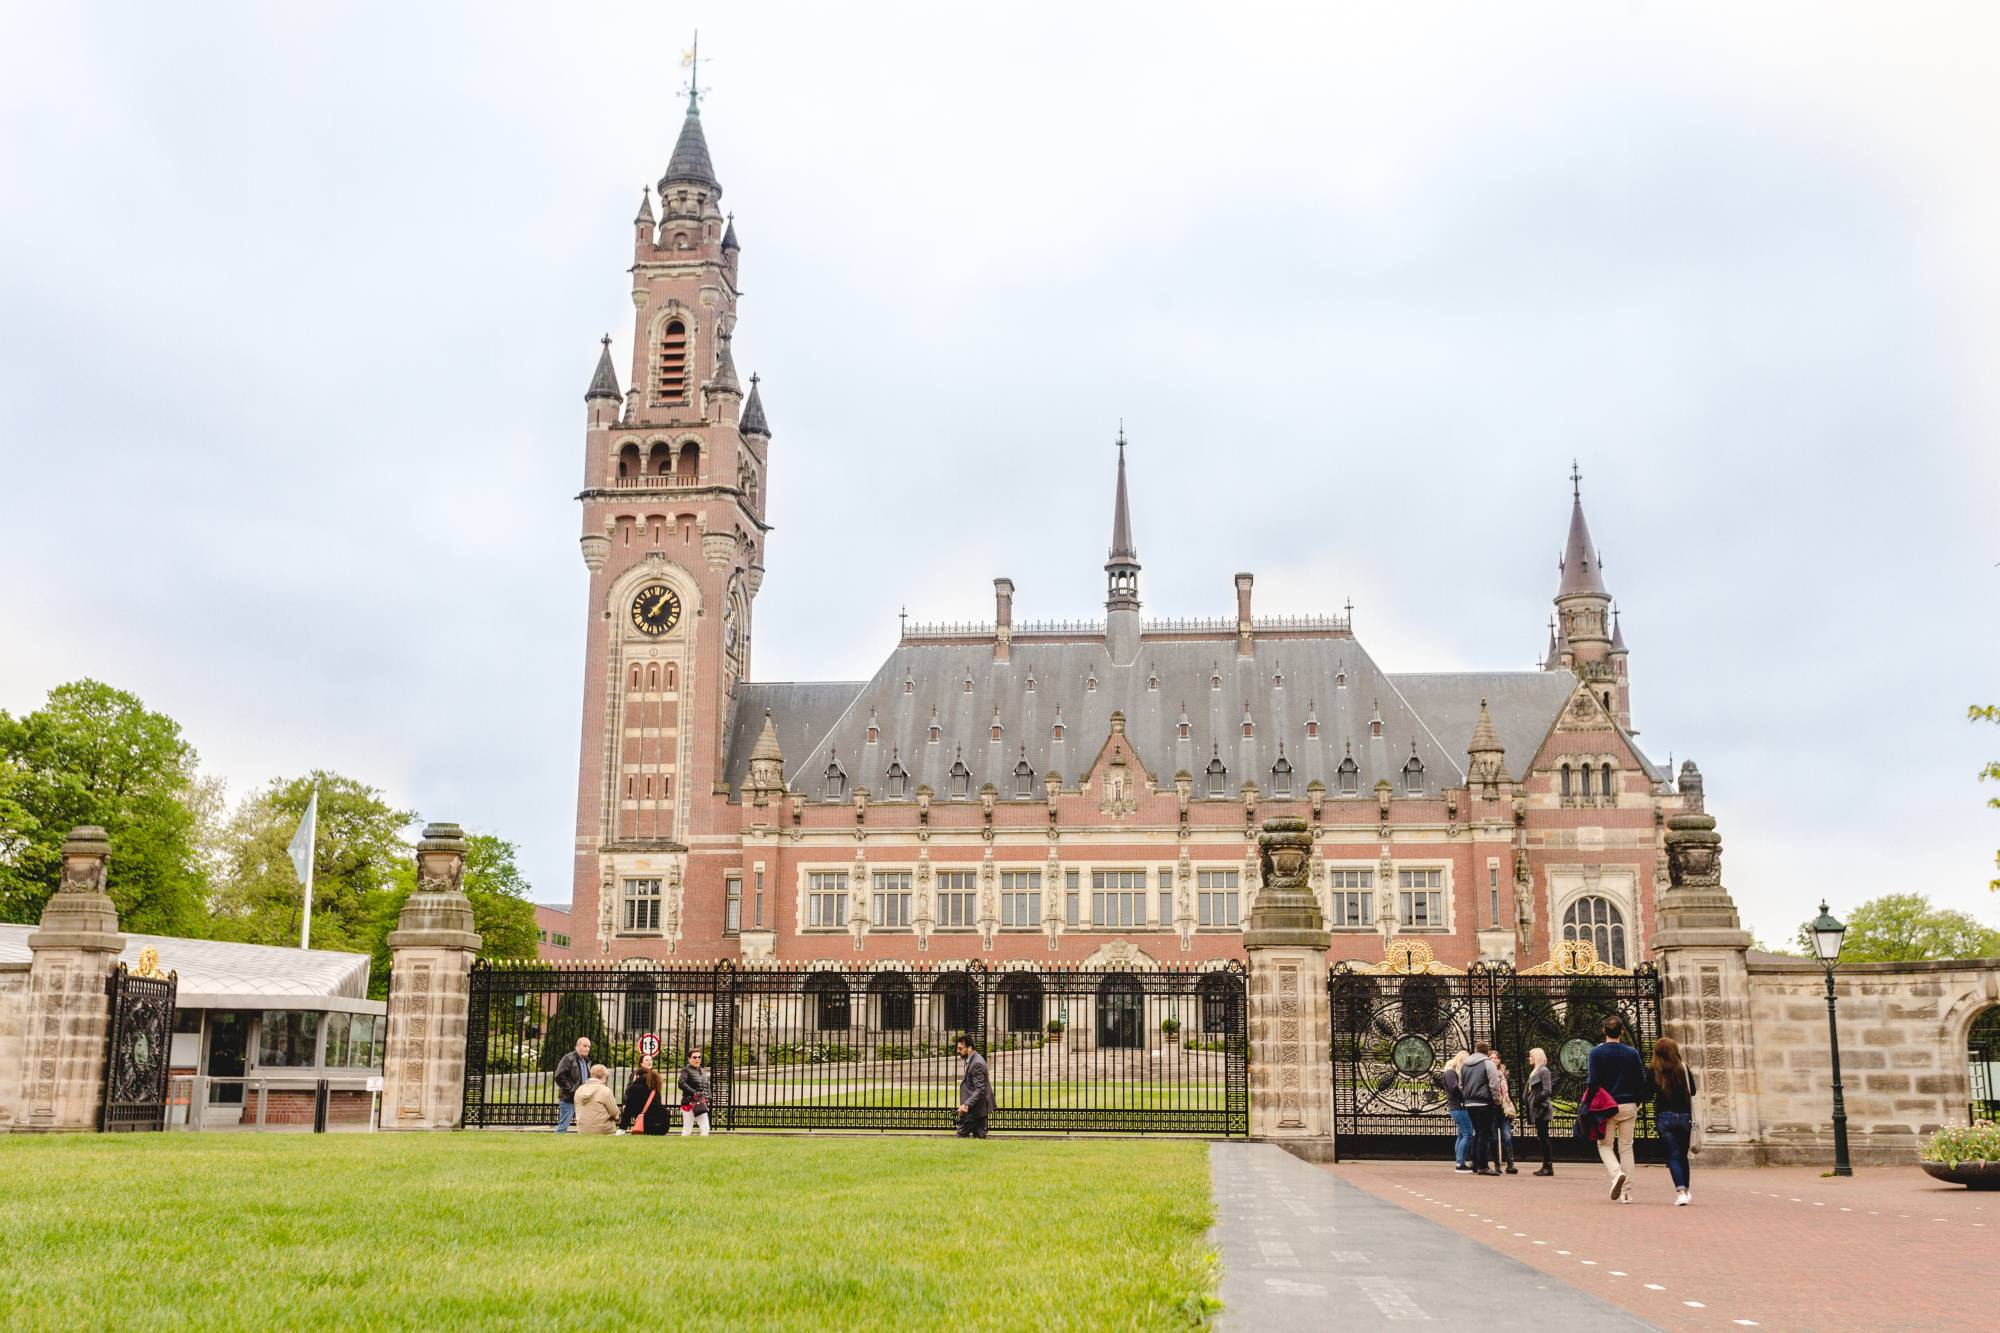 https://public.parariusoffice.nl/185/photos/huge/52064585.1558959950-426.jpg